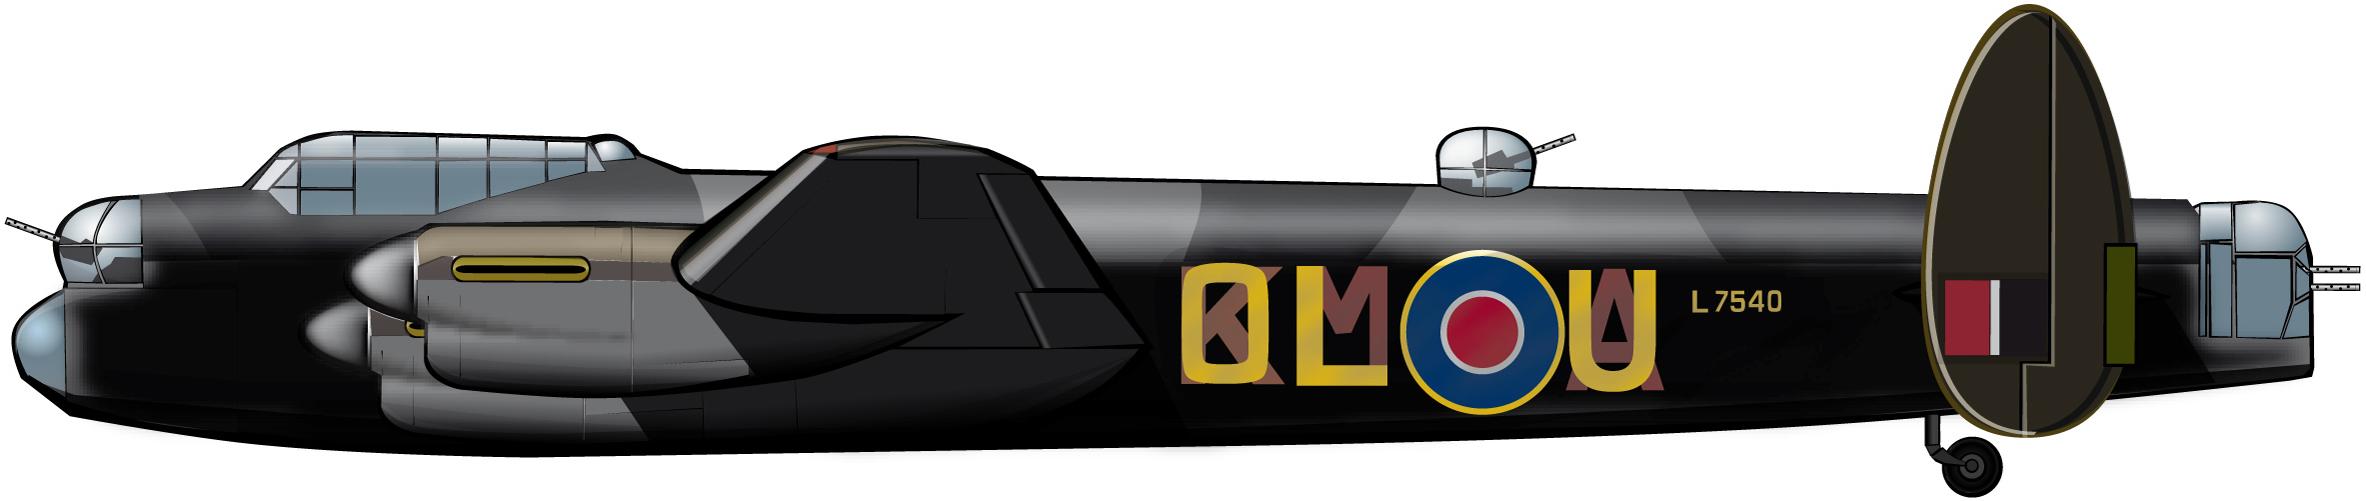 avrolancaster1944